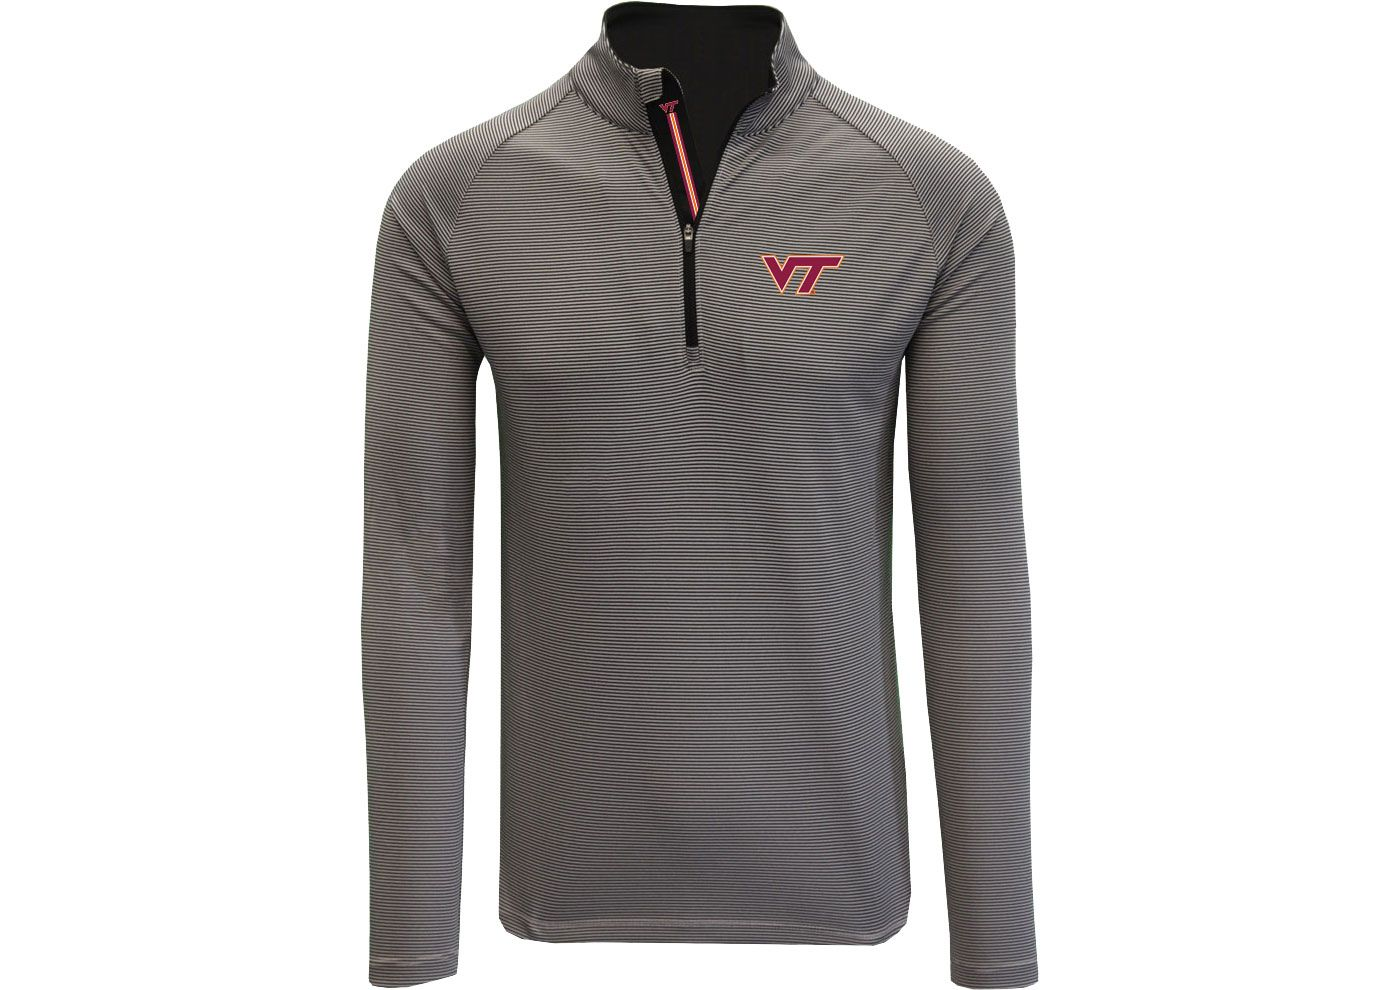 Levelwear Men's Virginia Tech Hokies Grey Orion Quarter-Zip Shirt